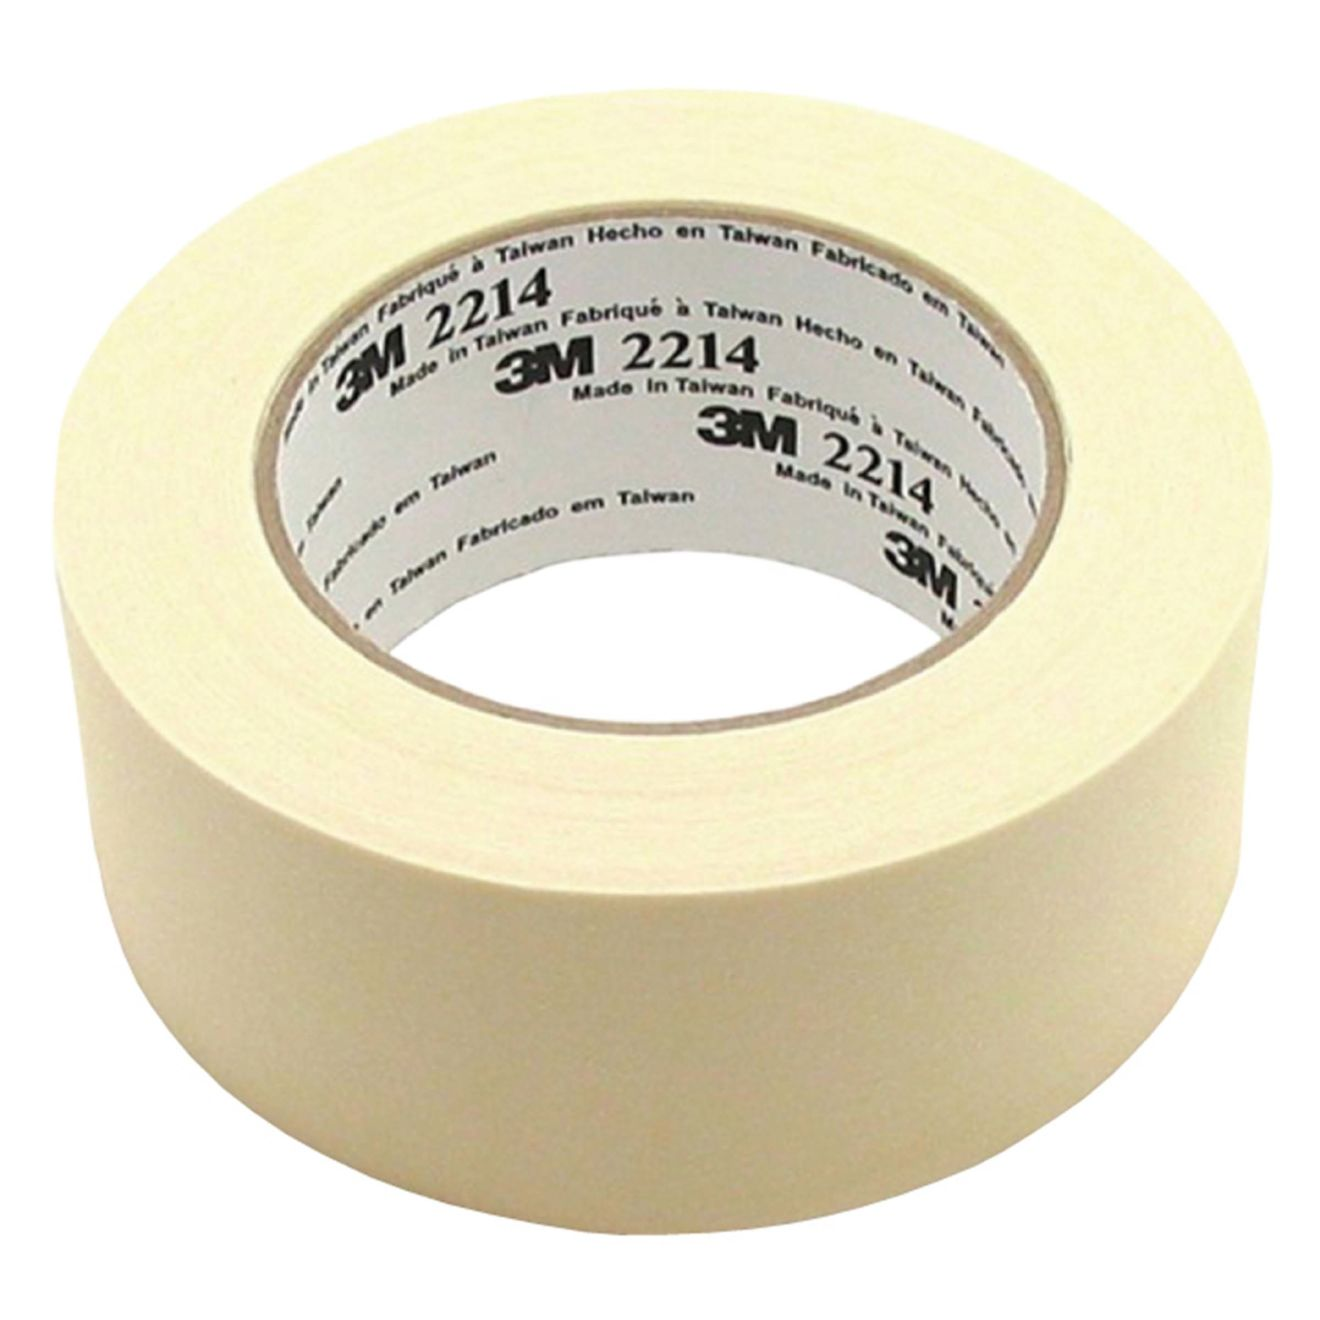 A Bottini 2 in. x 54.8 m. Utility Grade Masking Tape in White